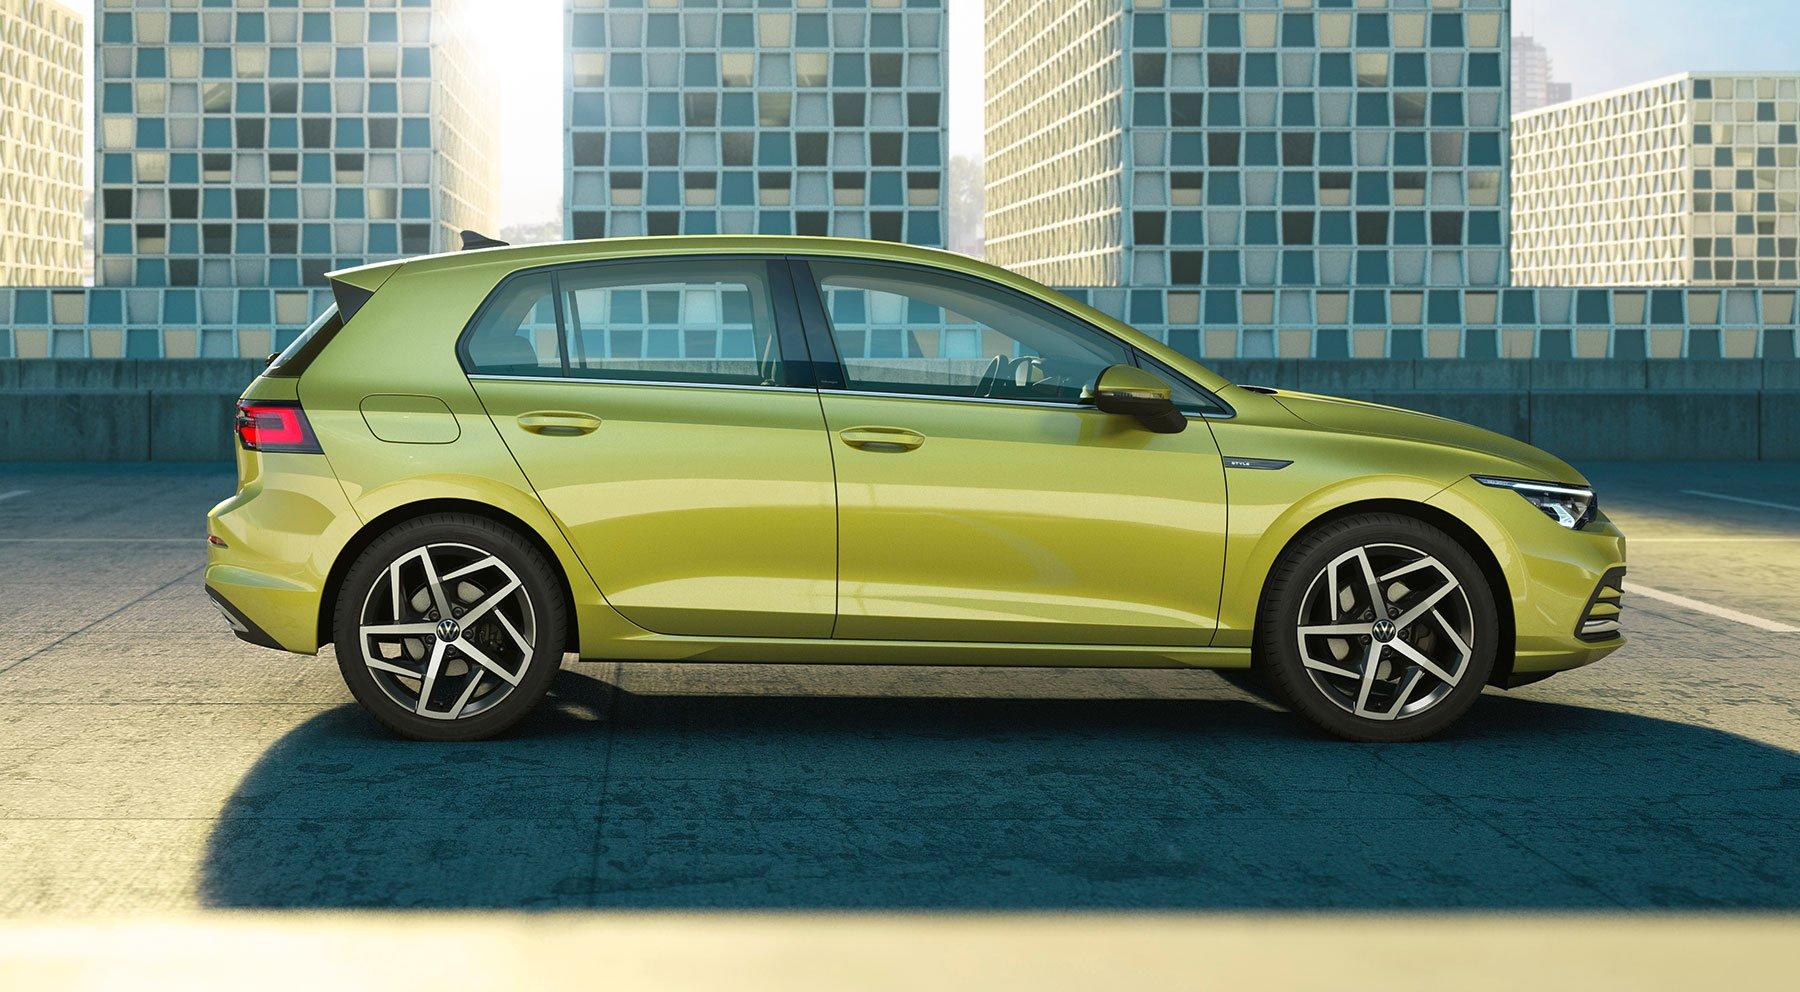 VW_Golf_8_leaked_0002